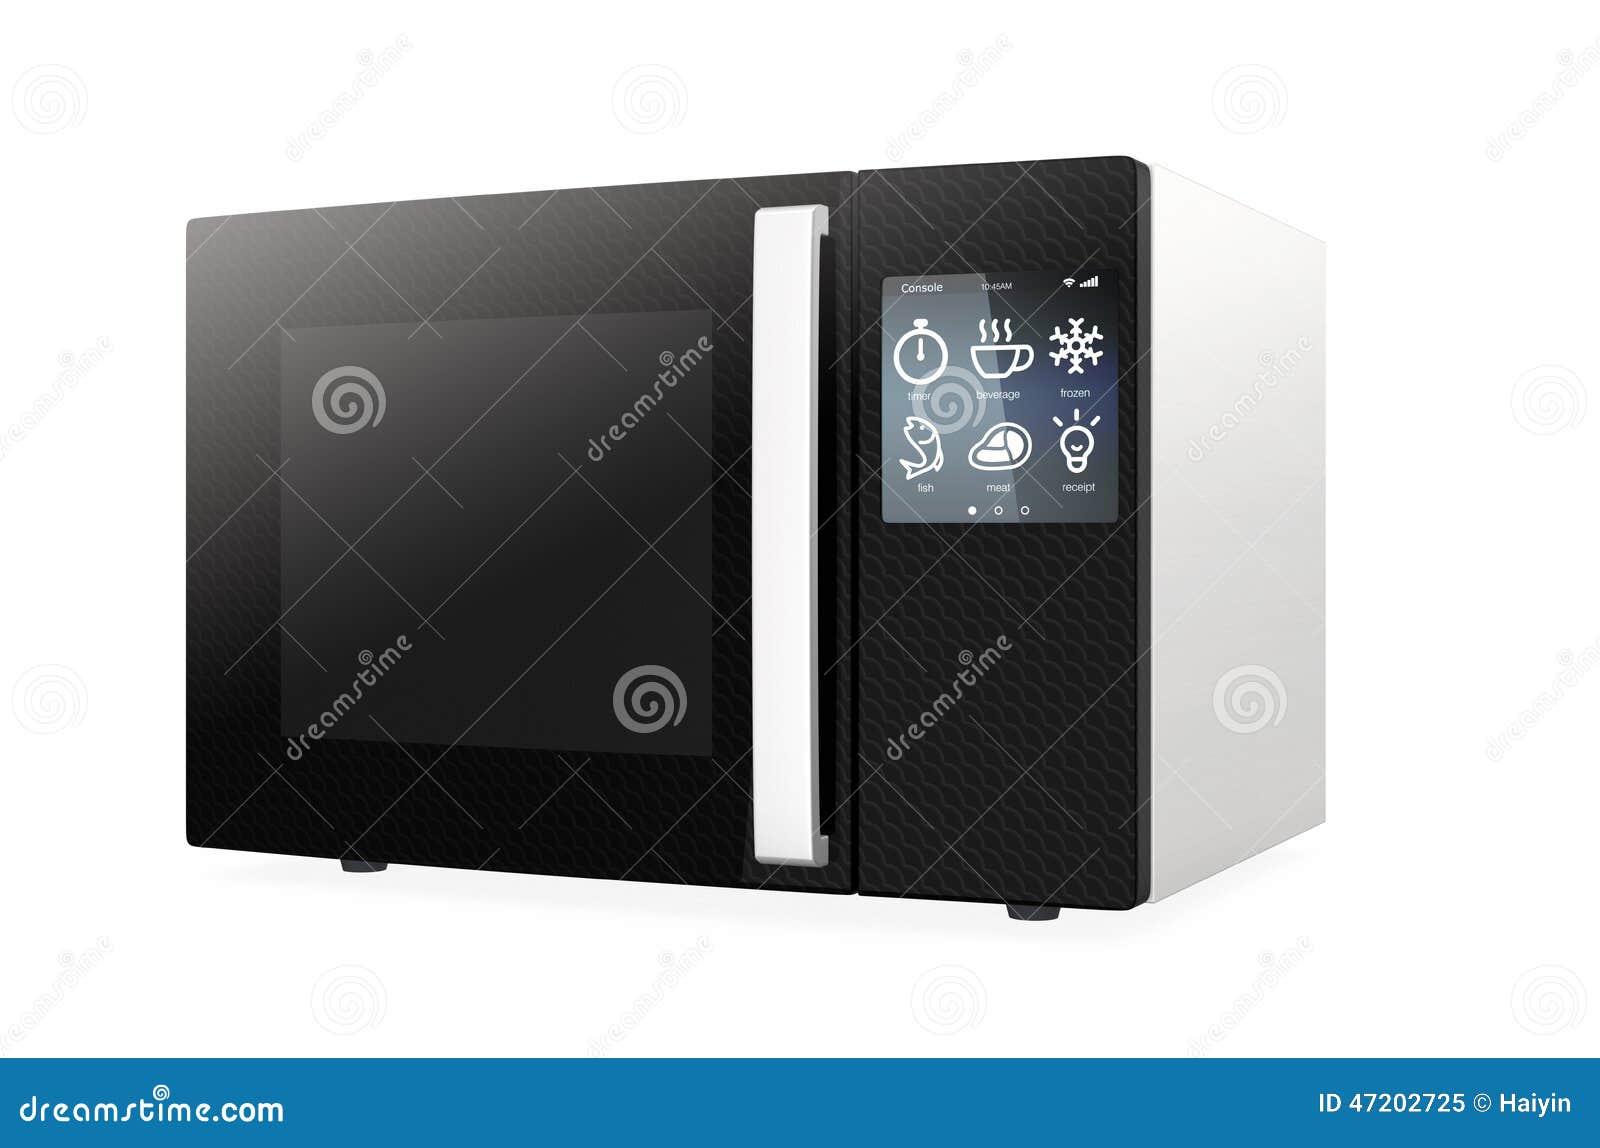 touchscreen. Black Bedroom Furniture Sets. Home Design Ideas